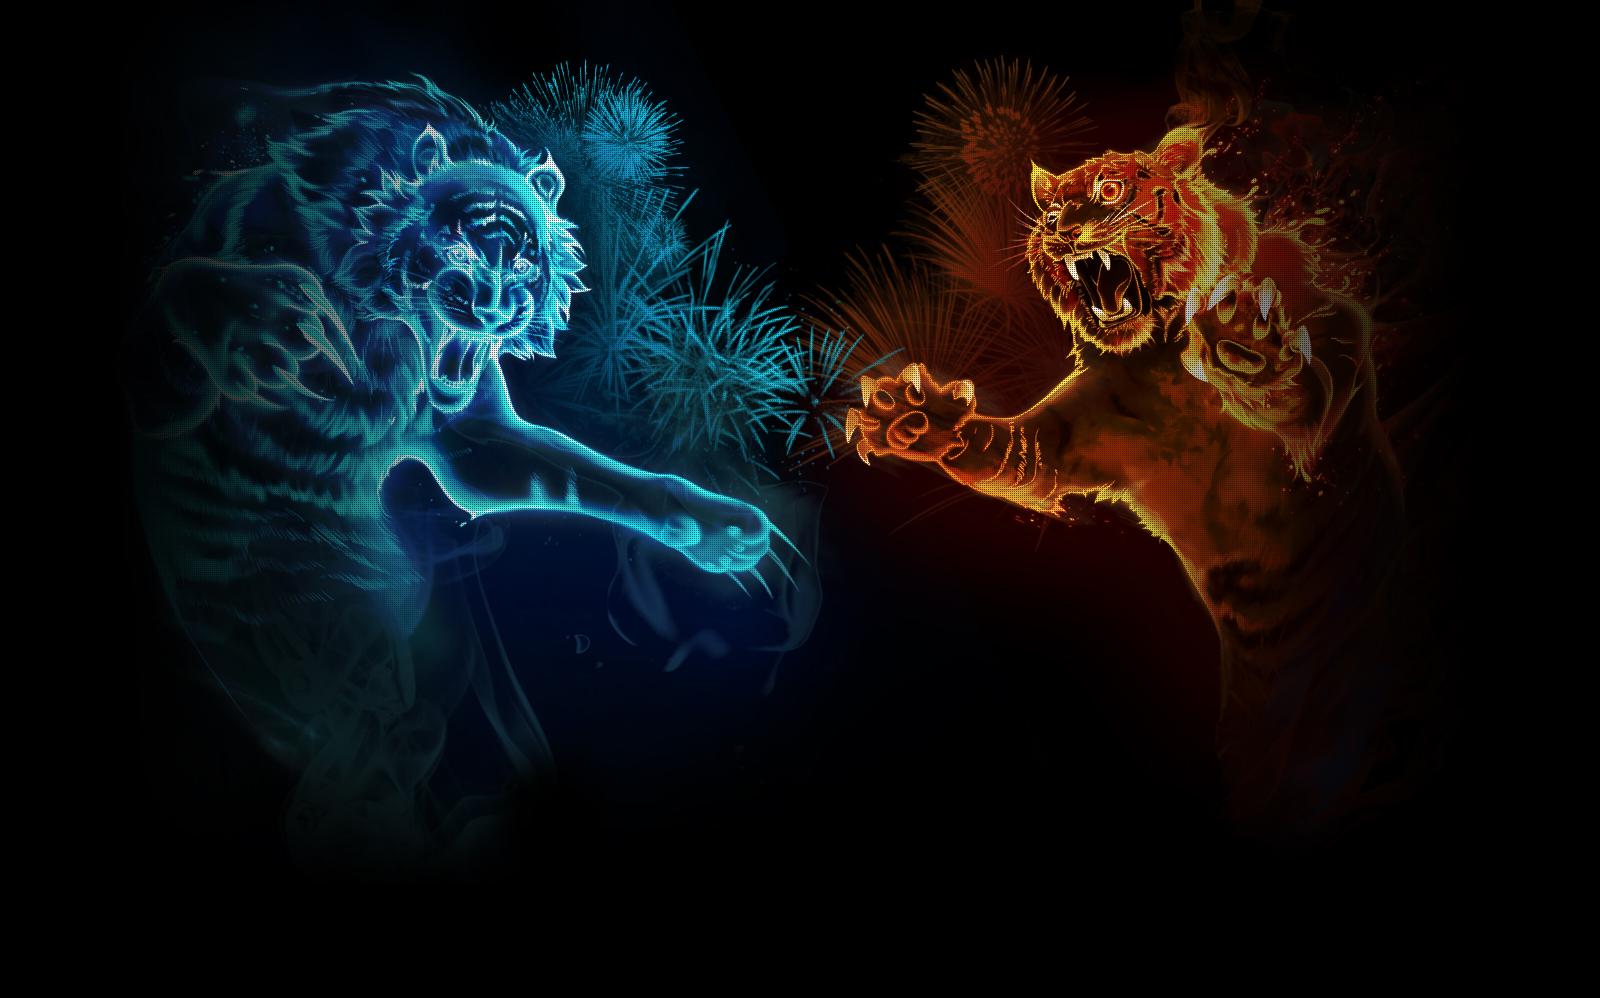 8k Animal Wallpaper Download: Tiger Wallpaper And Background Image